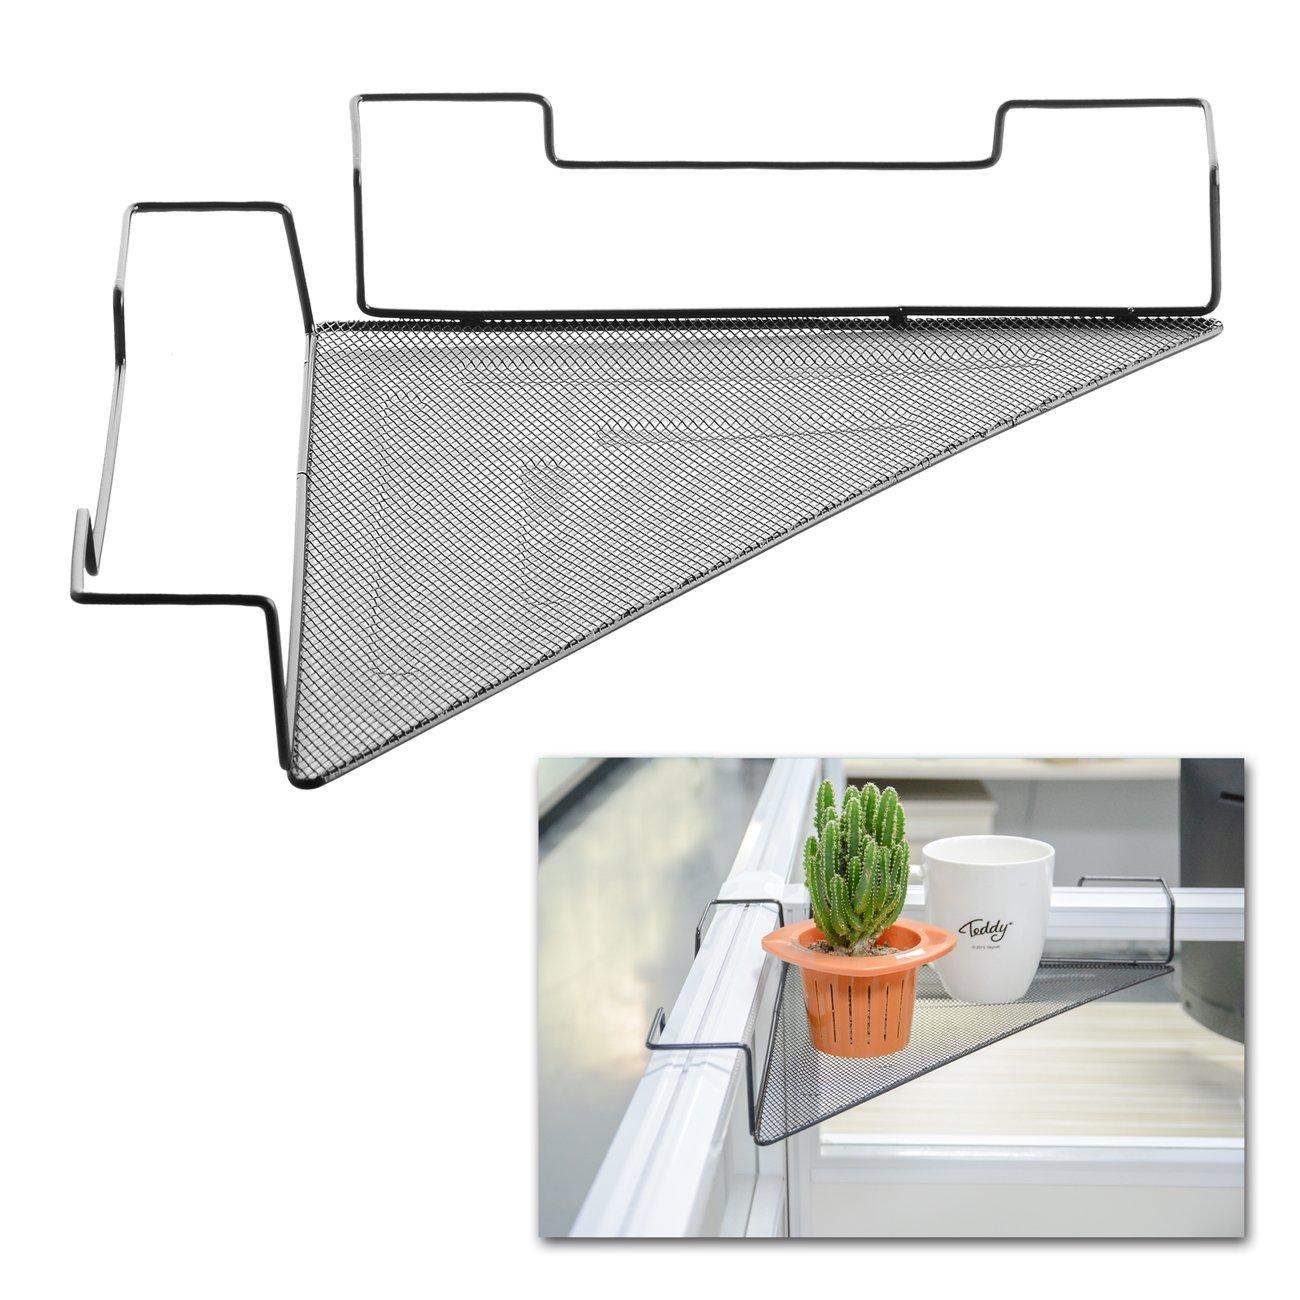 Cubicle Corner Shelf - Space-Saving Office Sundries Storage Rack Floating Organizer/Flower Pots Caddy -Iron Wire Rail with Mesh Panel - No Screw - (Black)